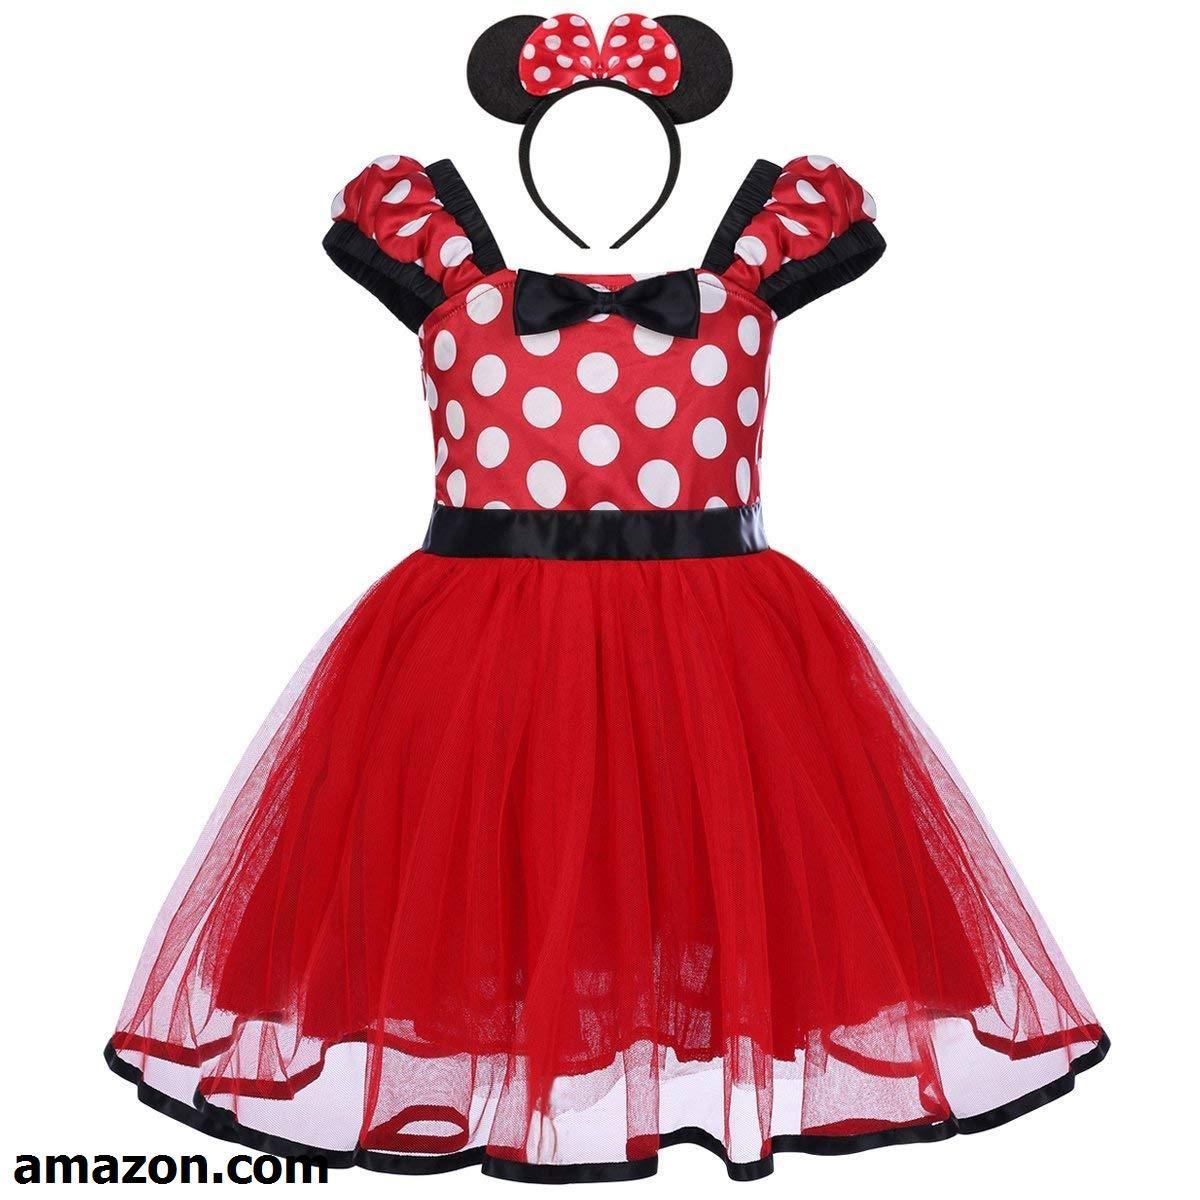 9a8e648894f1 FYMNSI Baby Girls Polka Dots Princess Ballet Tutu Dress Birthday ...